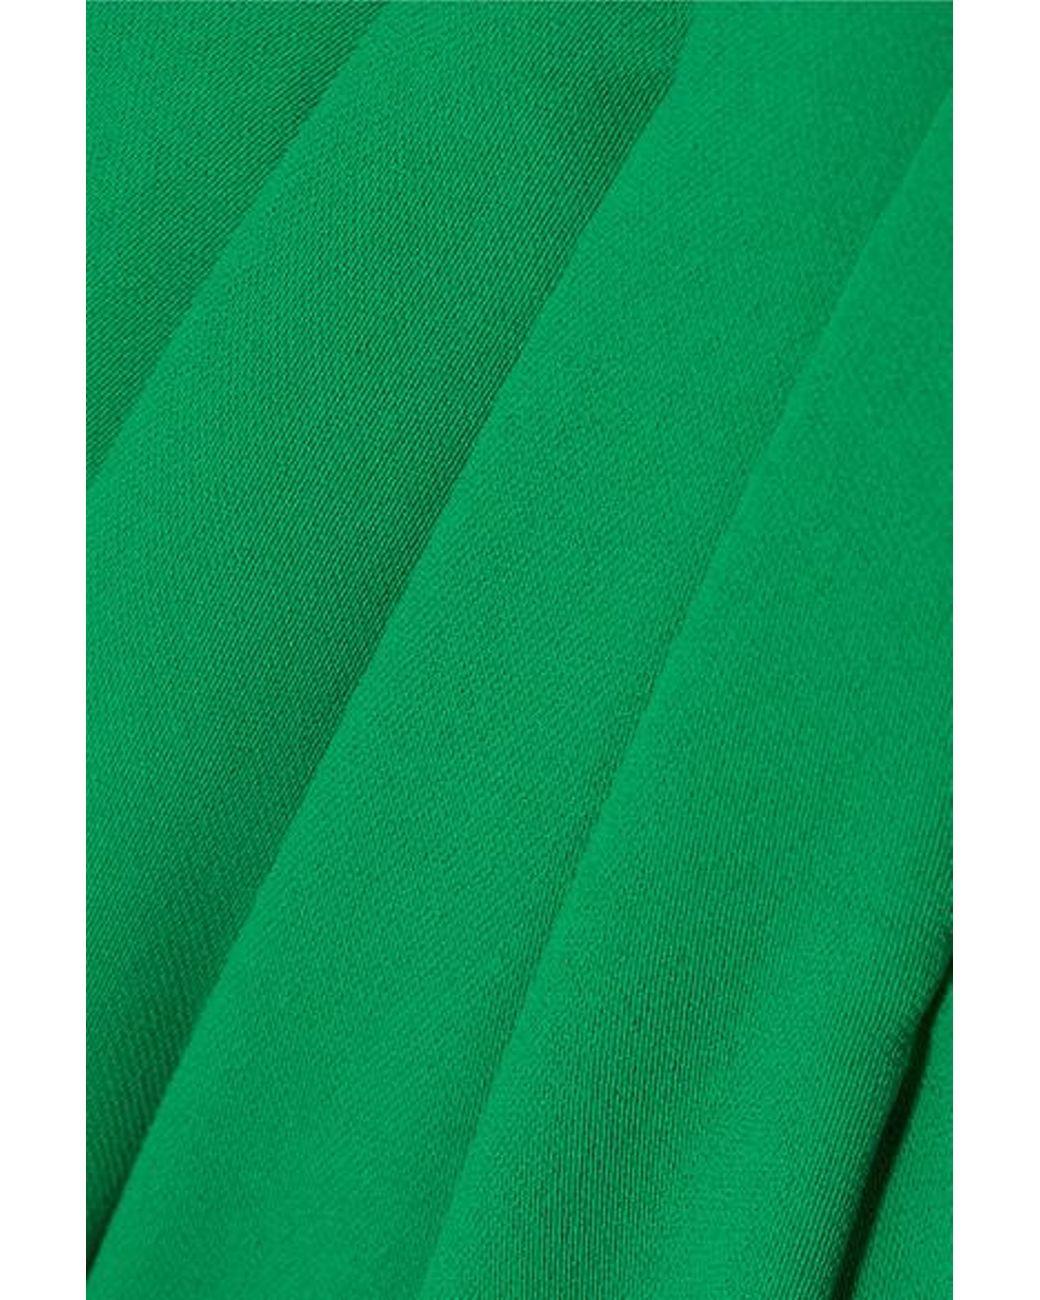 5e1350f5ea3 Marchesa notte Cape-effect Crepe Gown in Green - Lyst